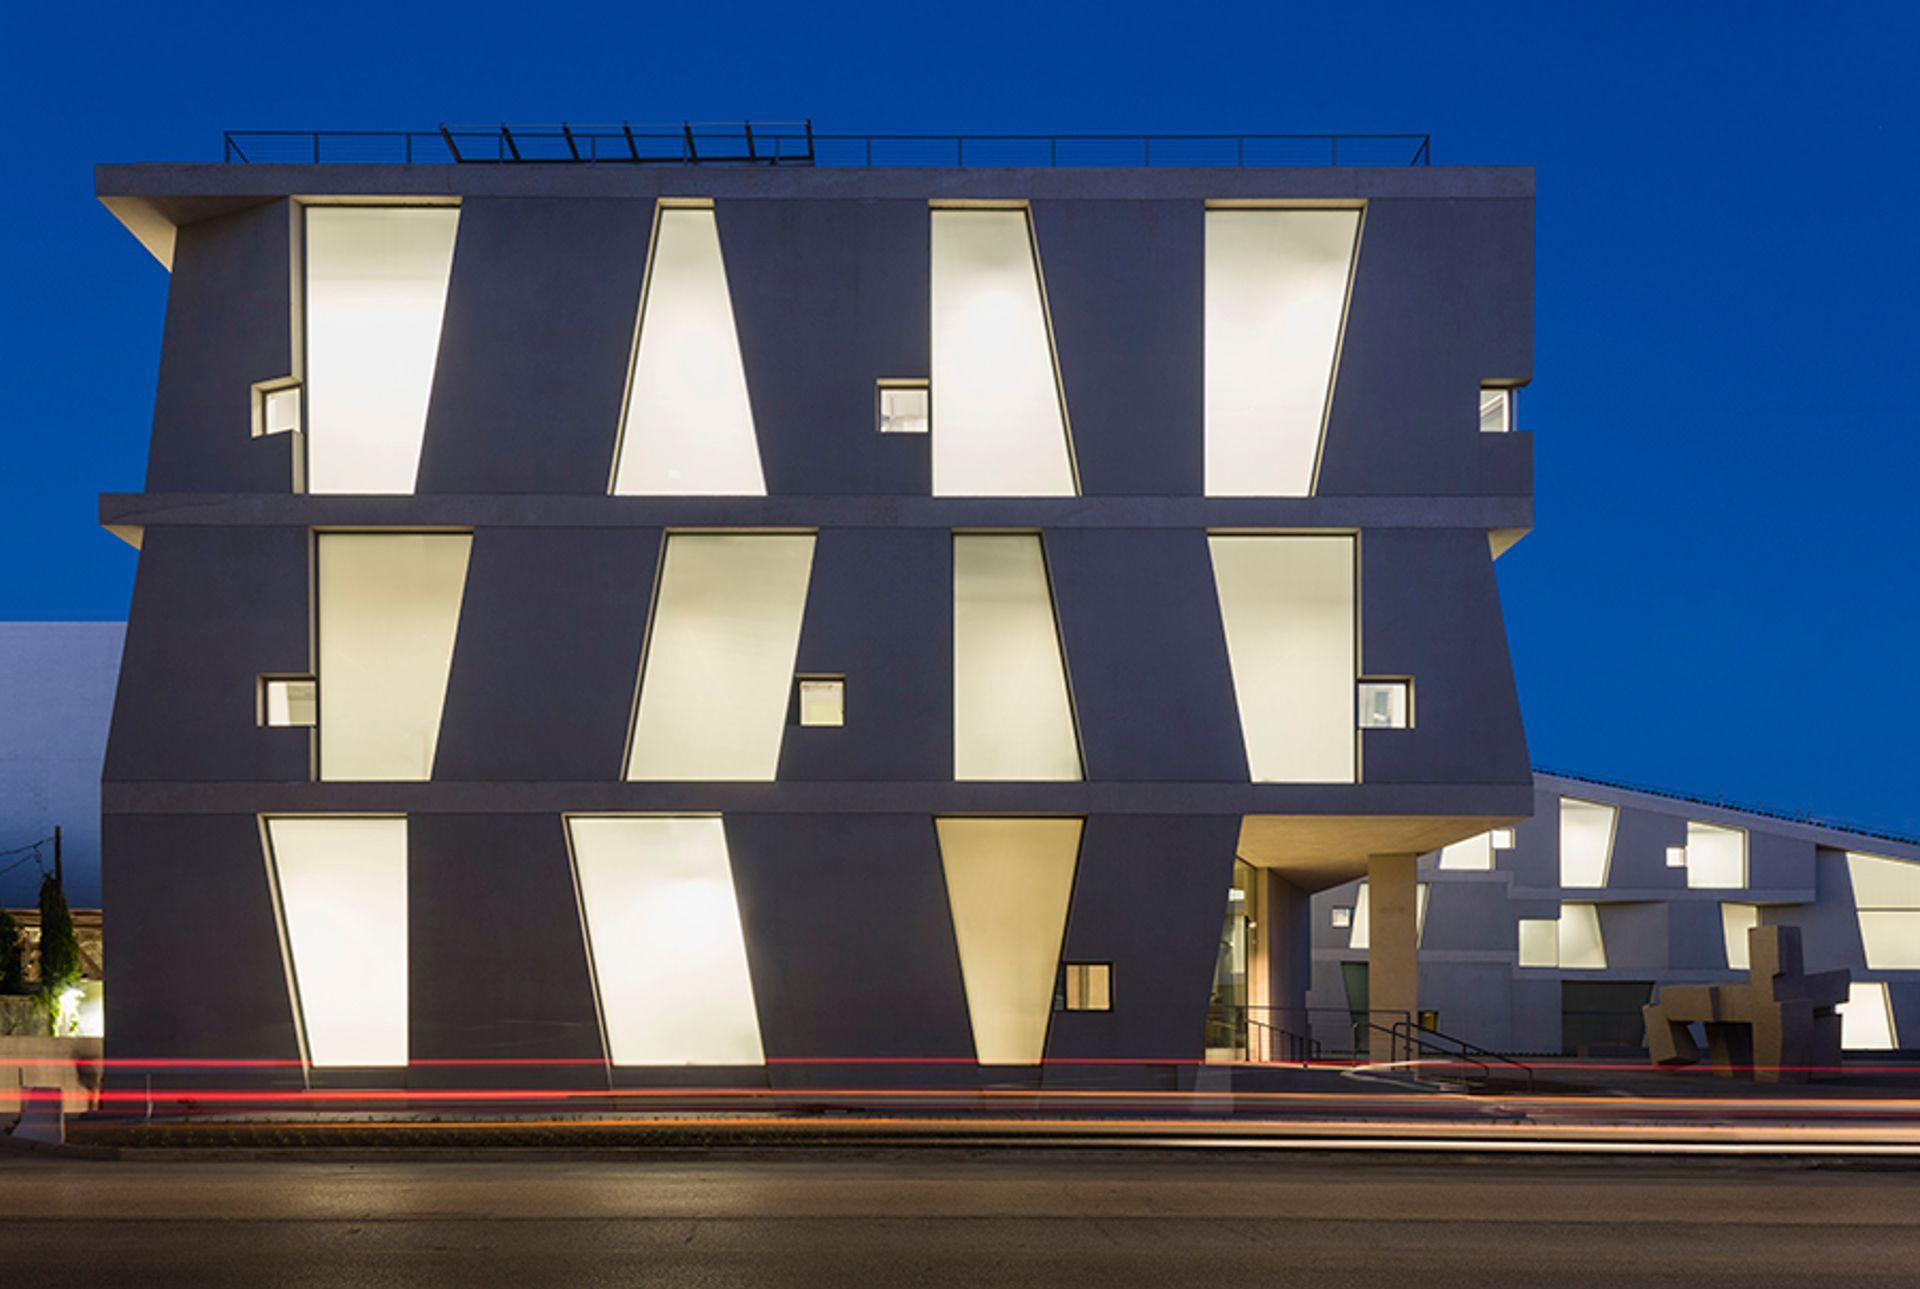 The Glassell School of Art's new building Richard Barnes